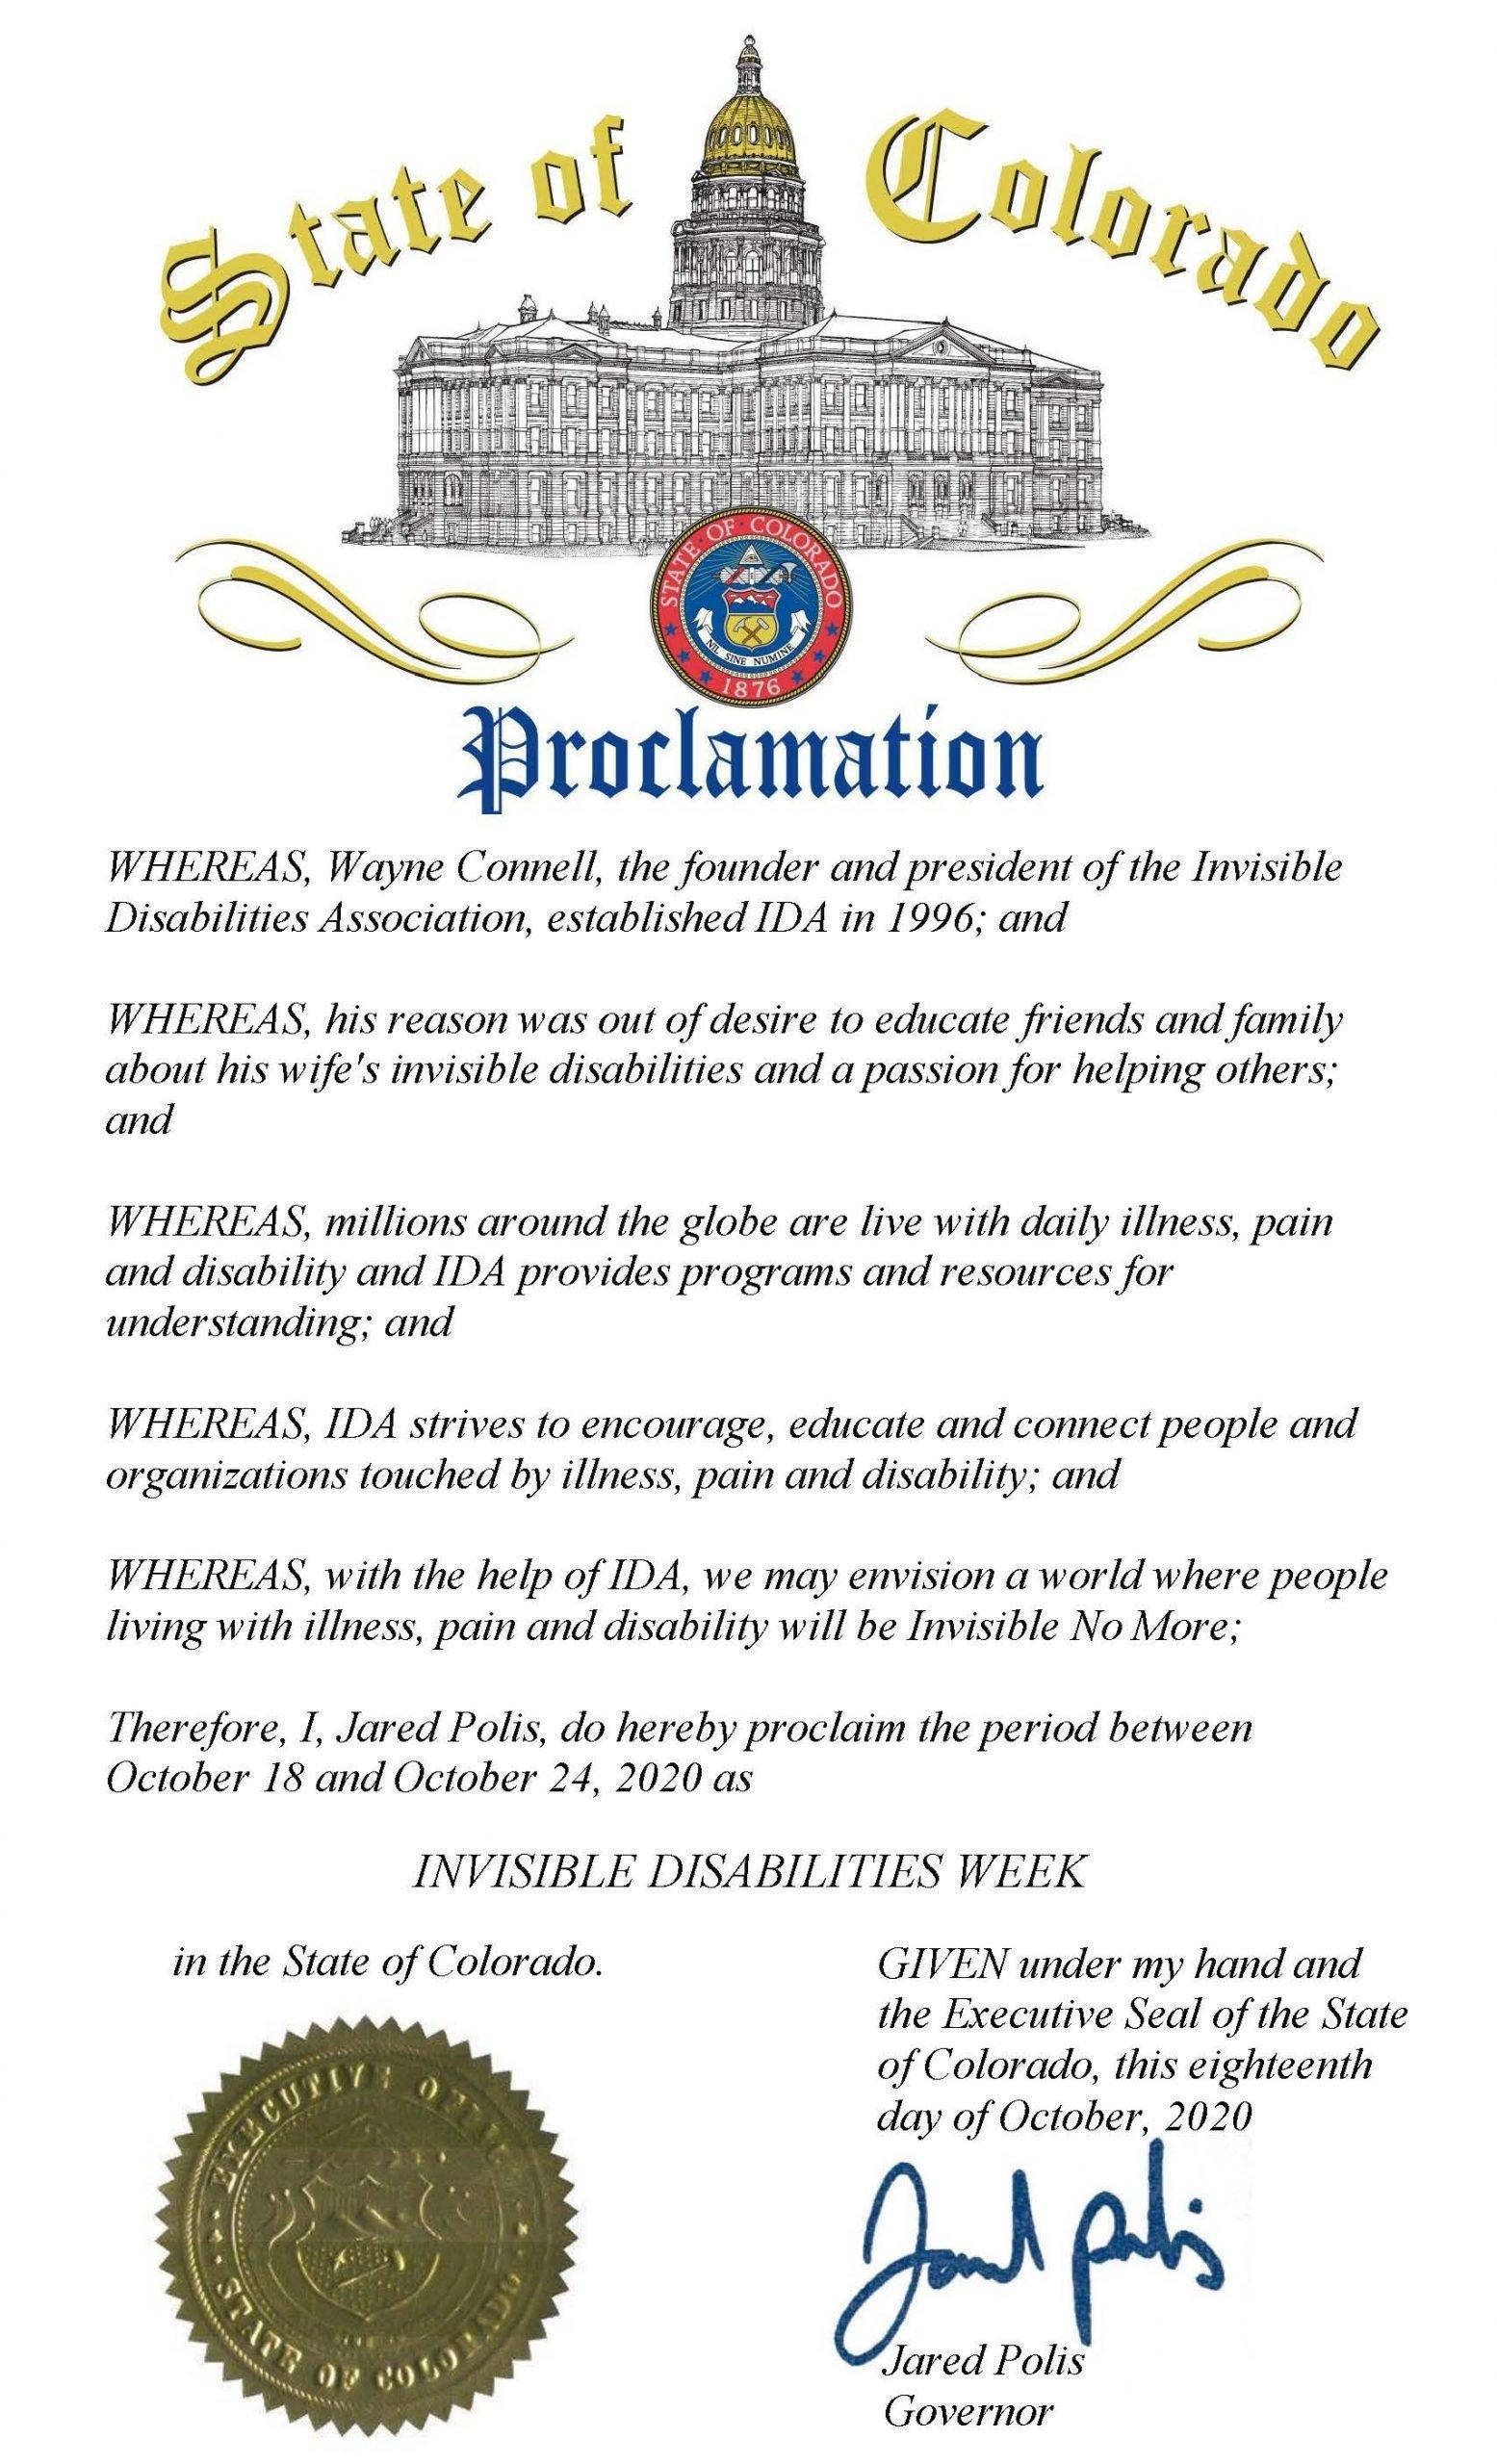 Colorado 2020 Invisible Disabilities Week Proclamation - Invisible Disabilities Association